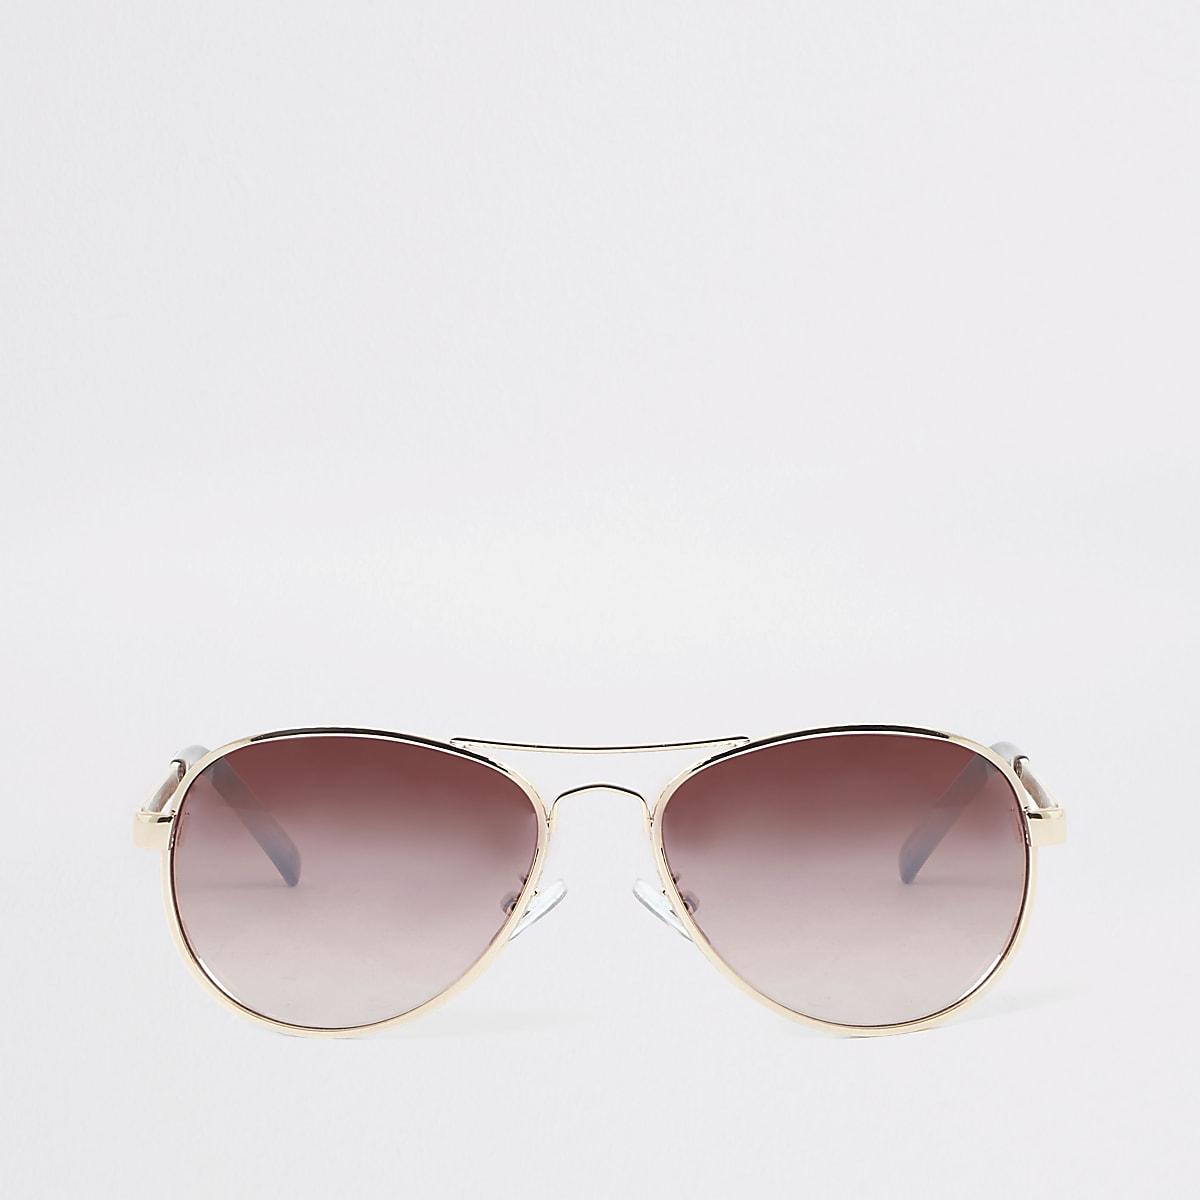 Gold tone textured aviator sunglasses